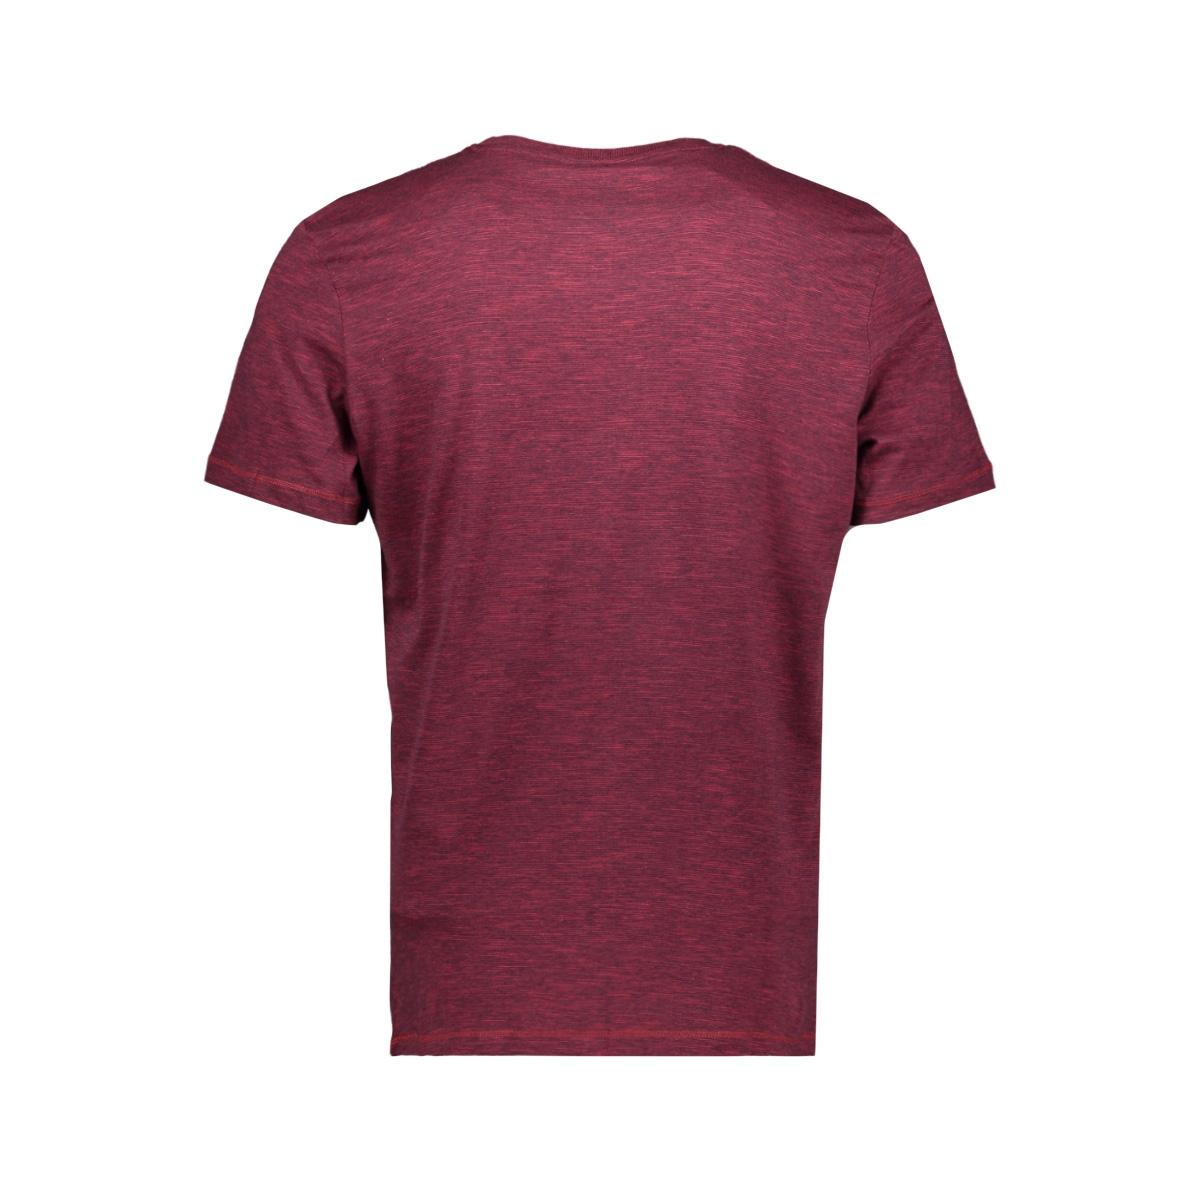 t shirt met print 1008640xx10 tom tailor t-shirt 19494